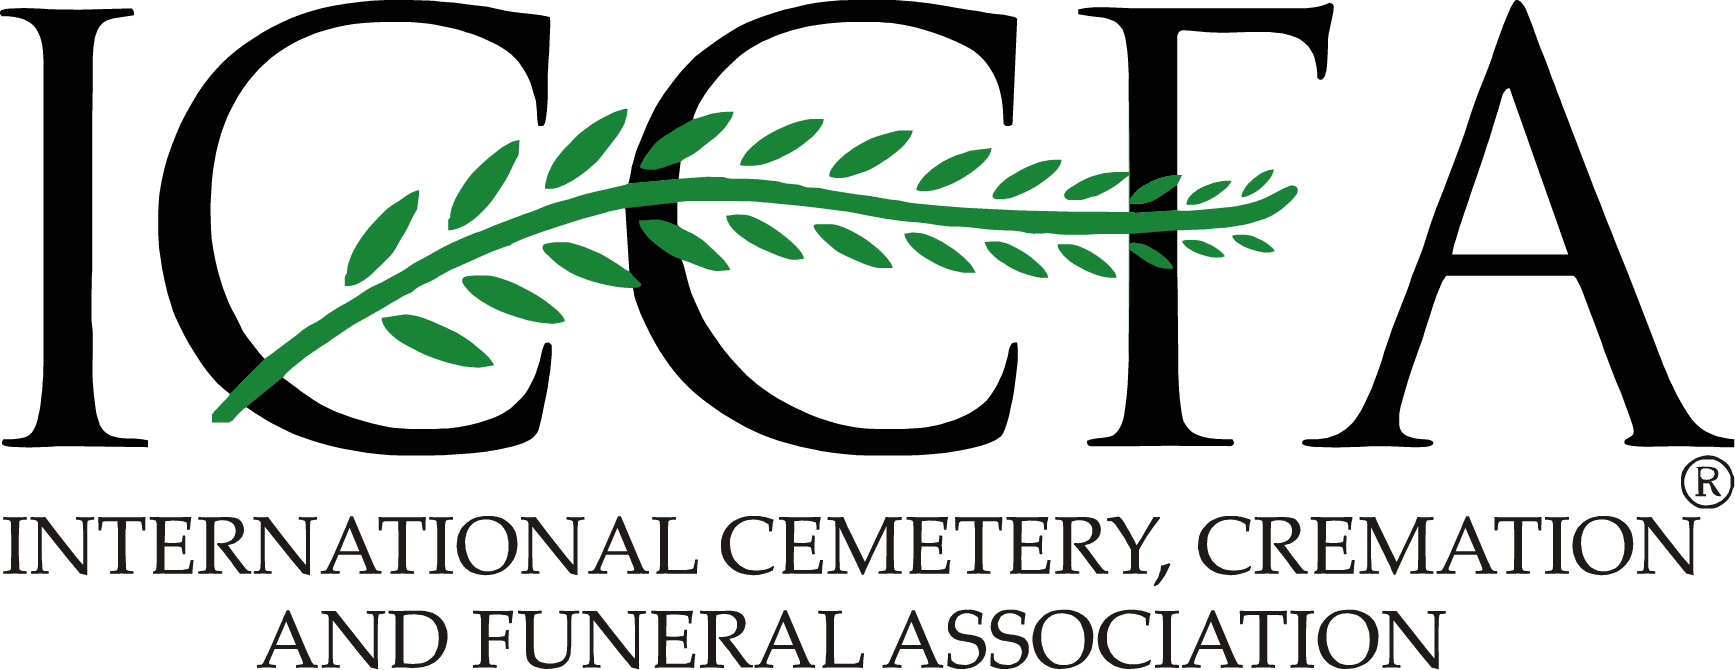 International Cemetery Crematory Funeral Association (ICCFA)